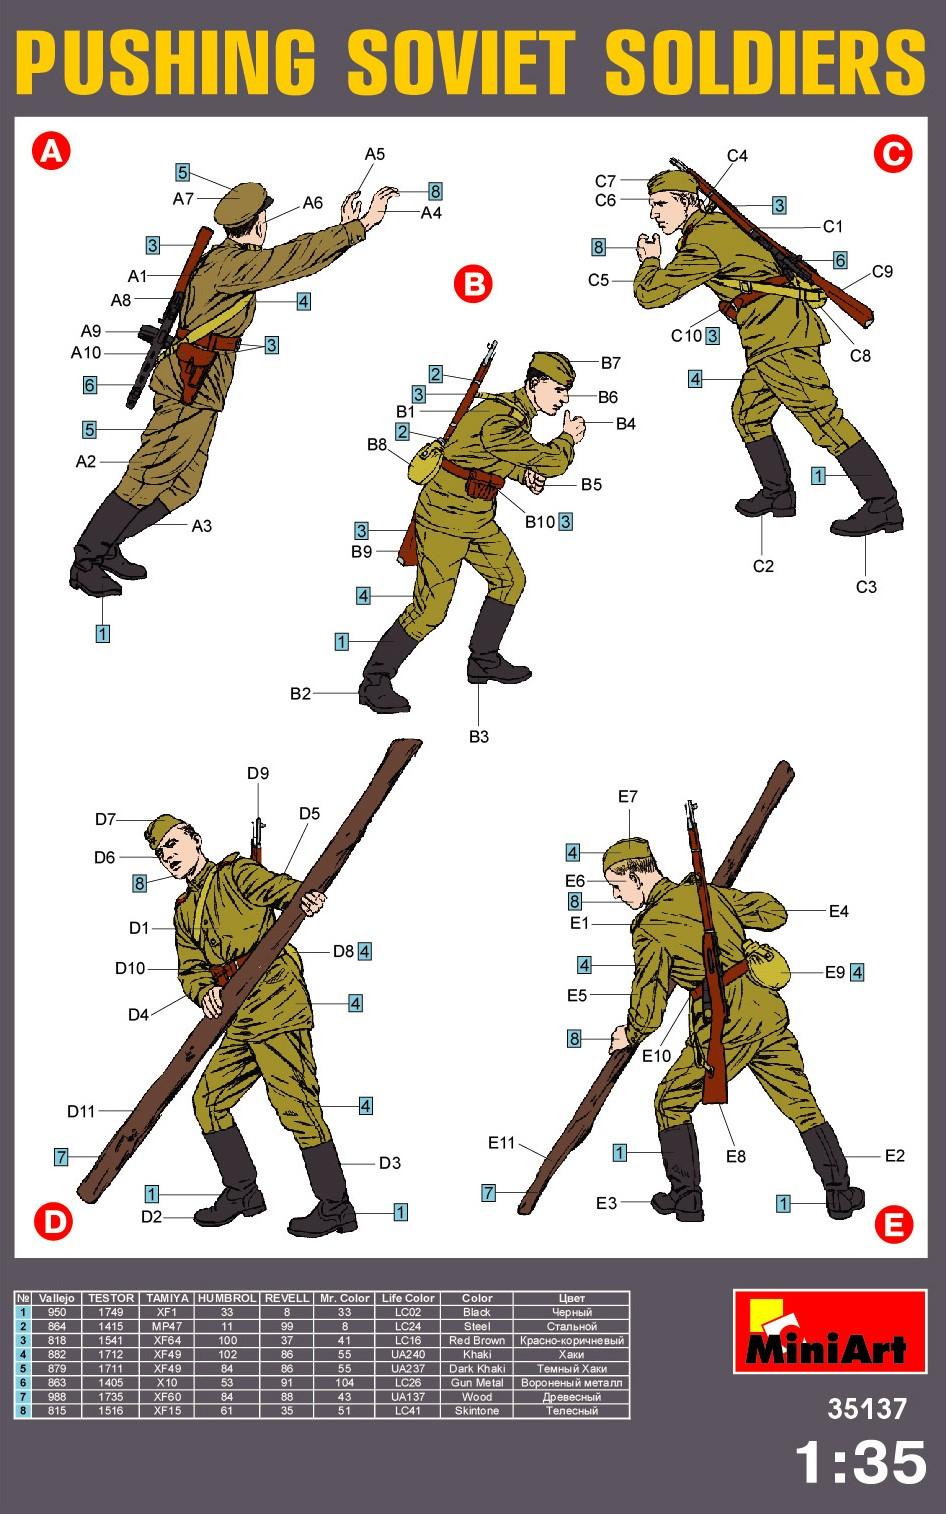 35017 SOVIET TANK CREW AT WORK